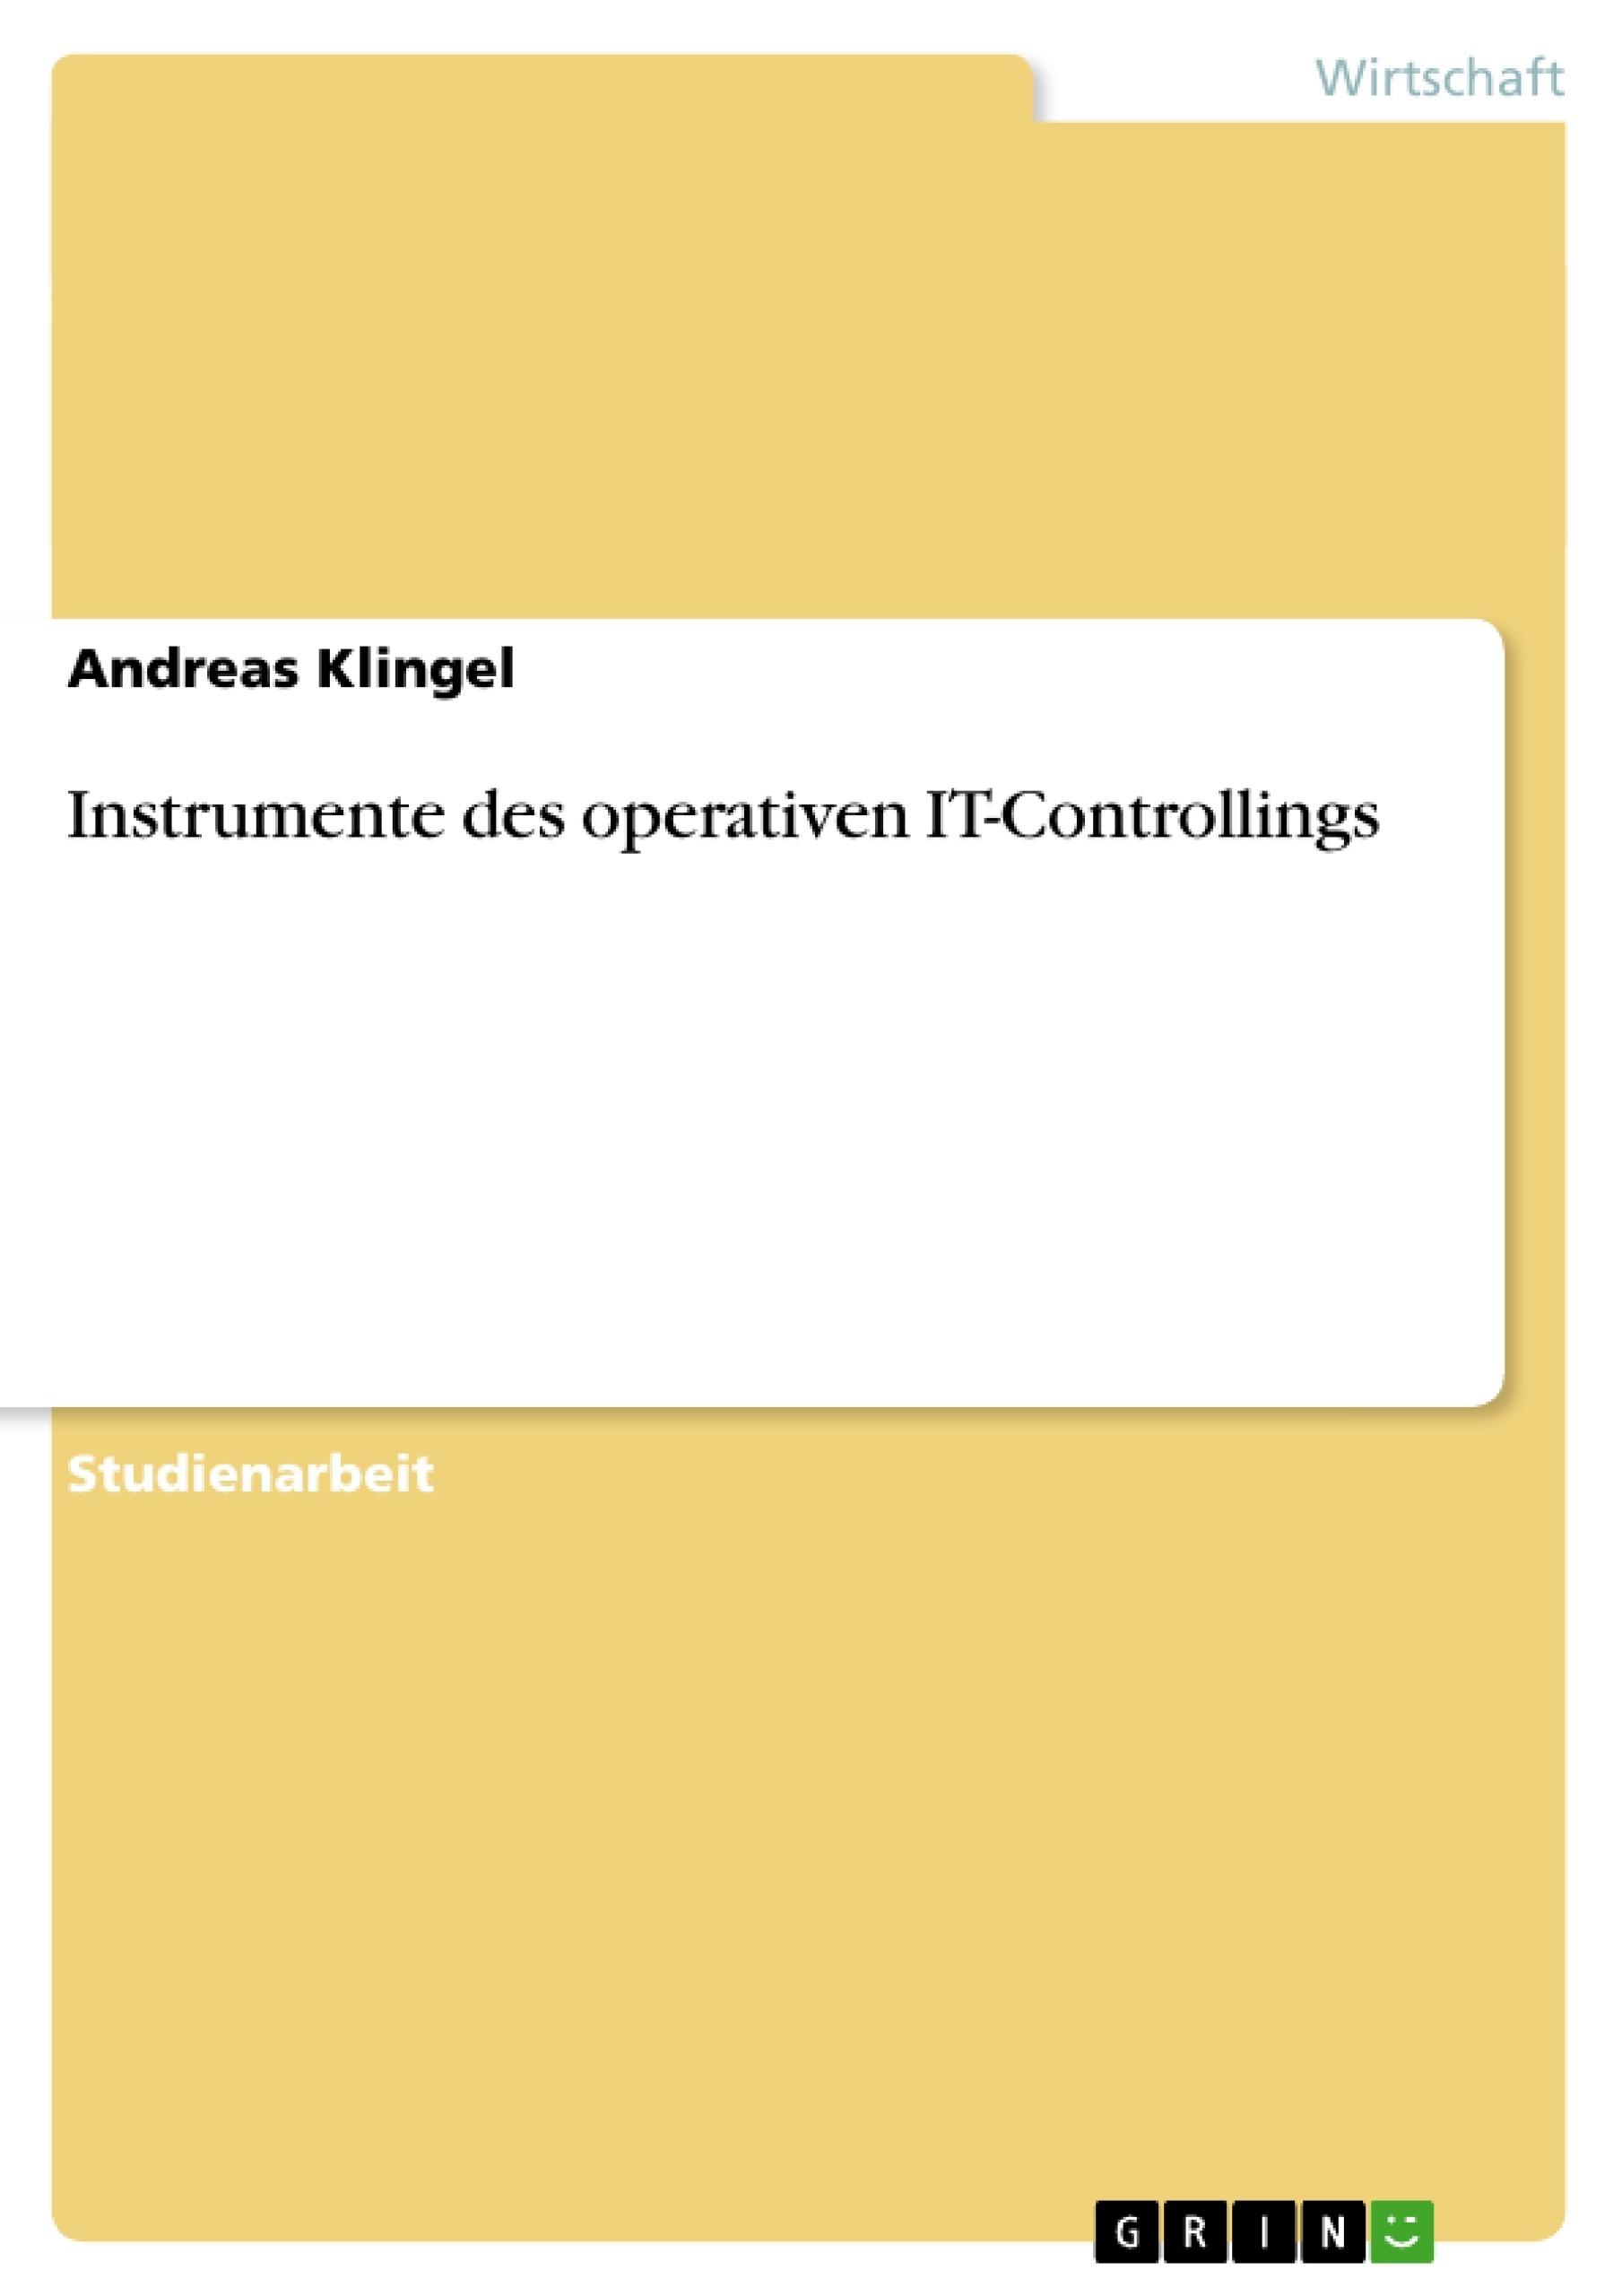 Titel: Instrumente des operativen IT-Controllings